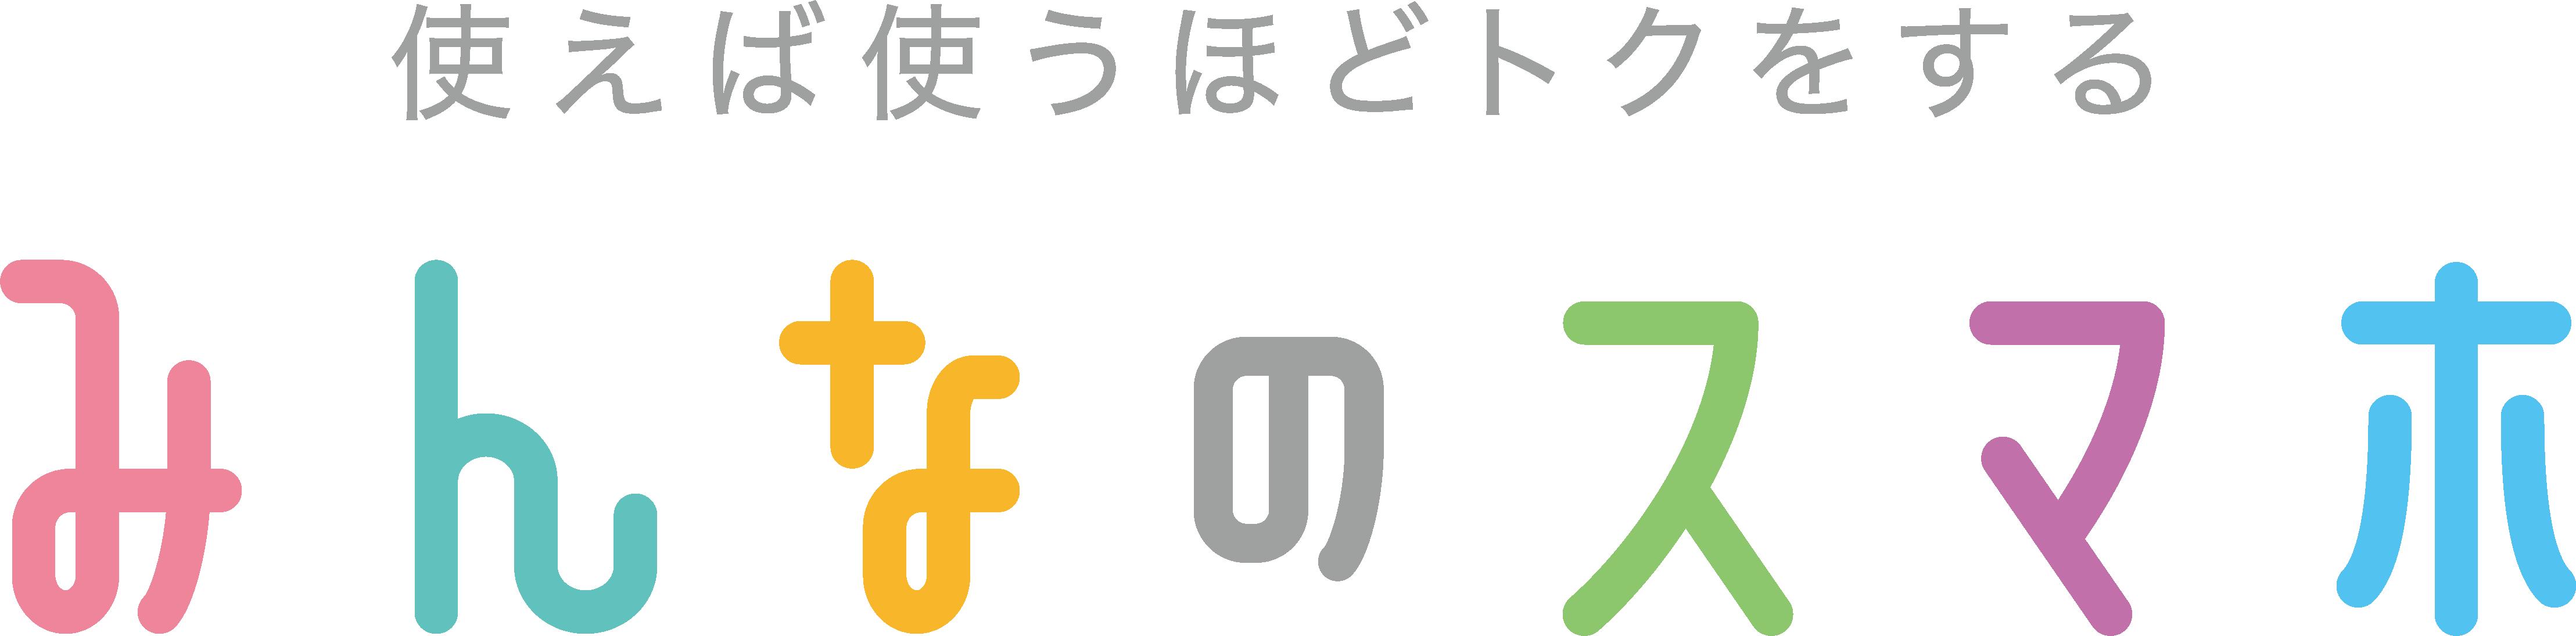 株式会社携帯市場ロゴ